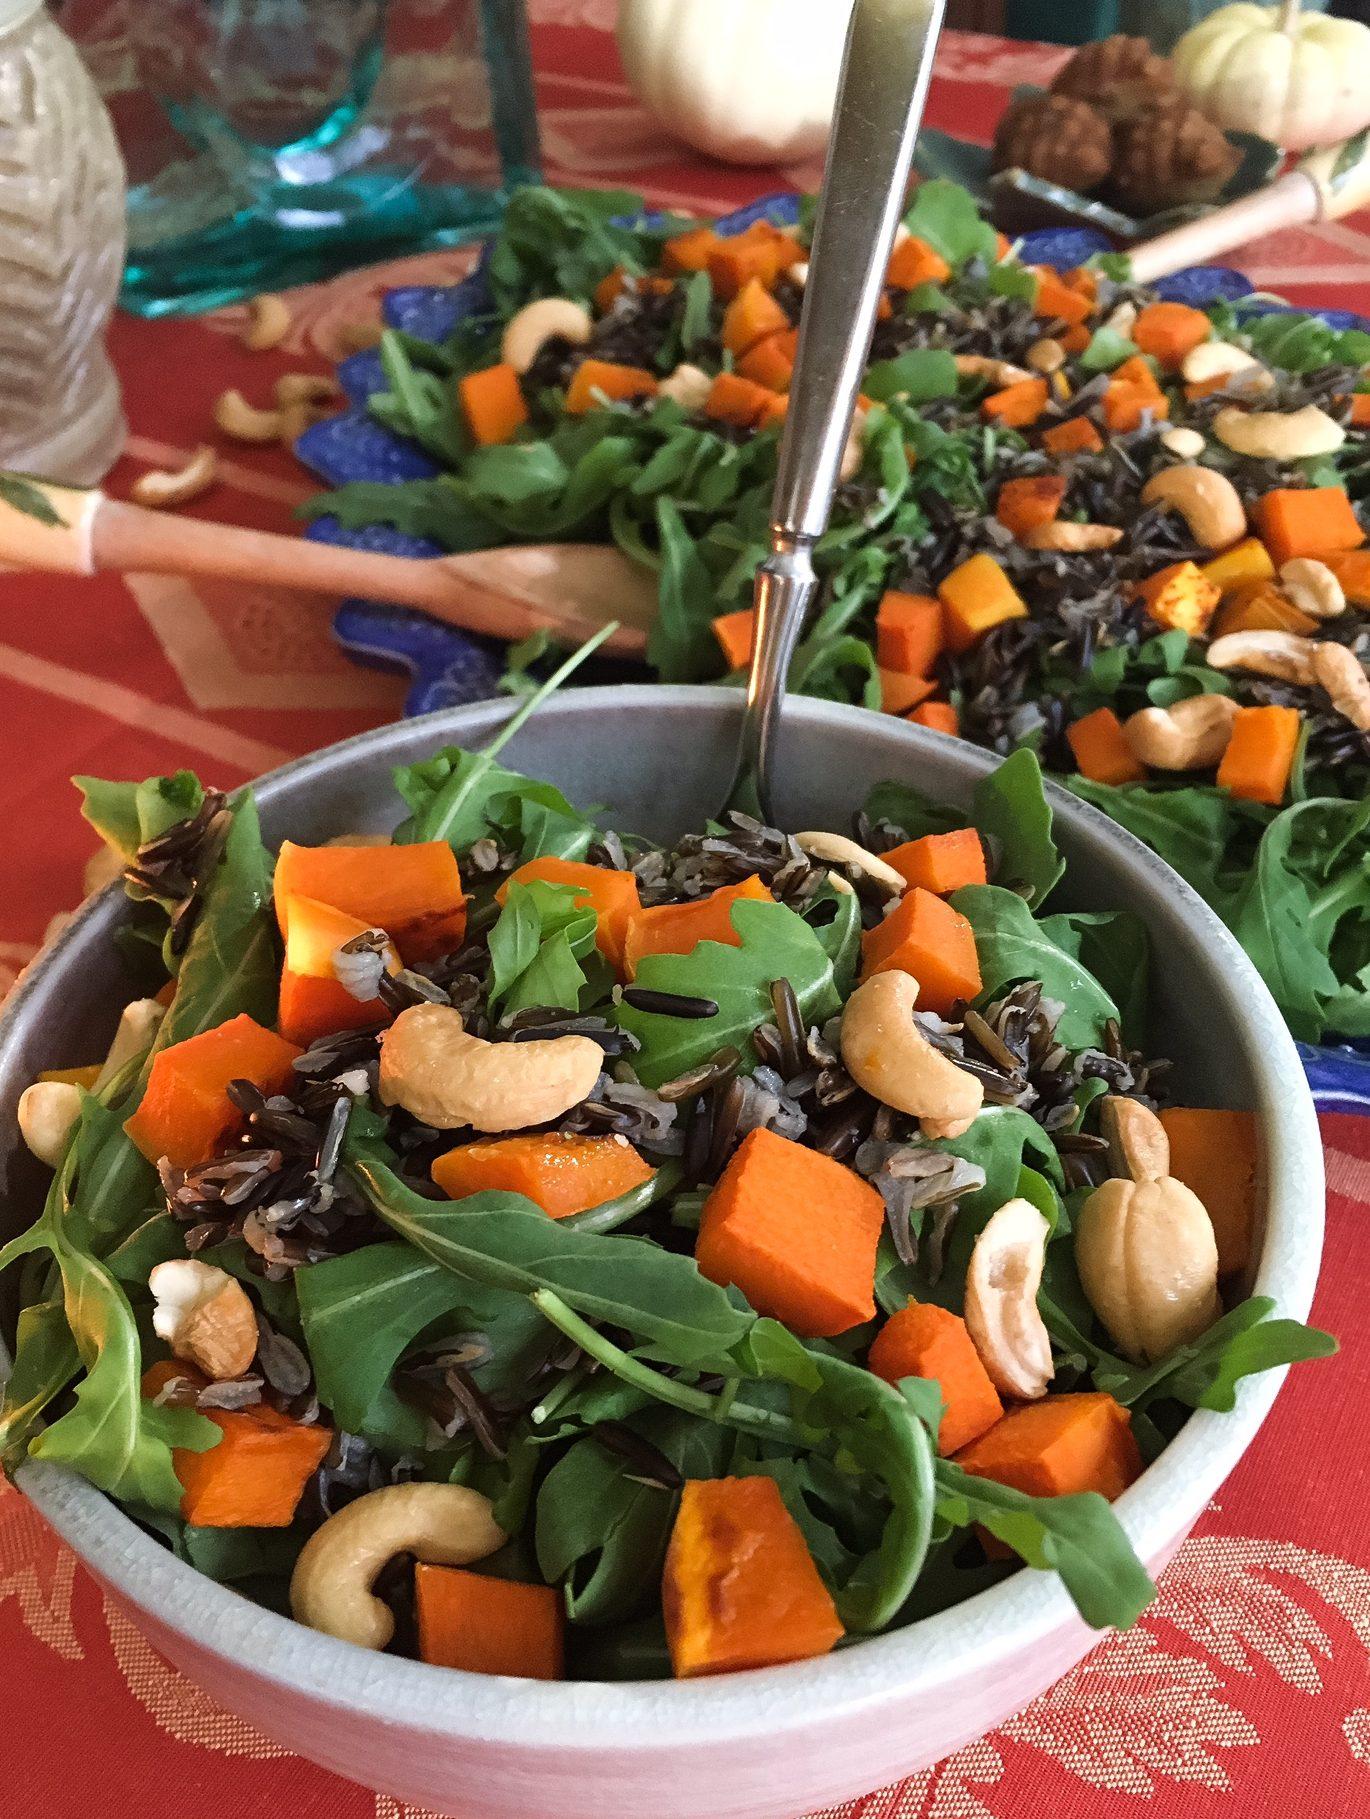 arugula, arugula salad, salad, fall salad, fall, black rice, butternut squash, squash, cashews